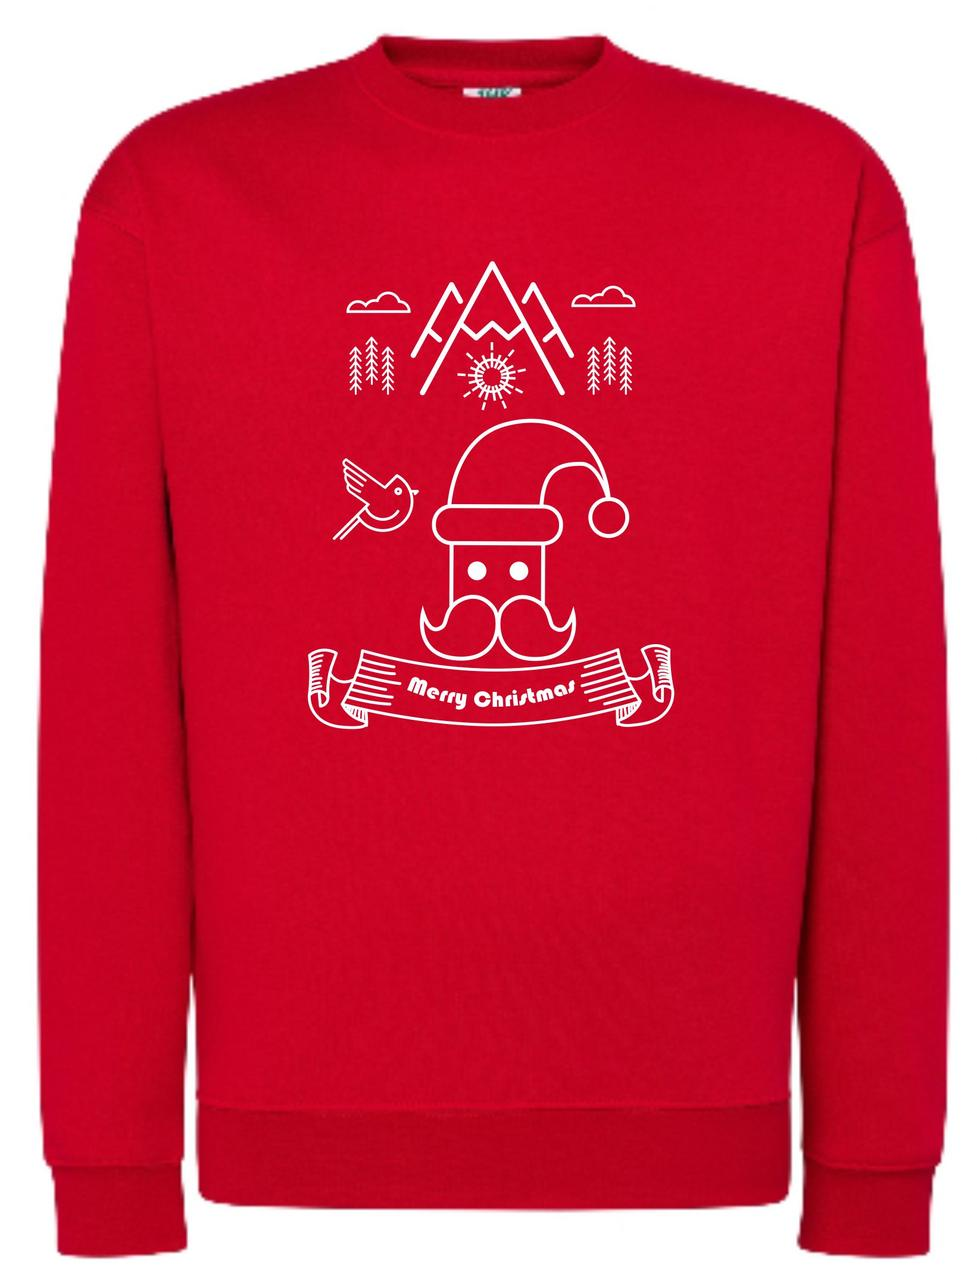 Реглан унісекс Merry Christmas red